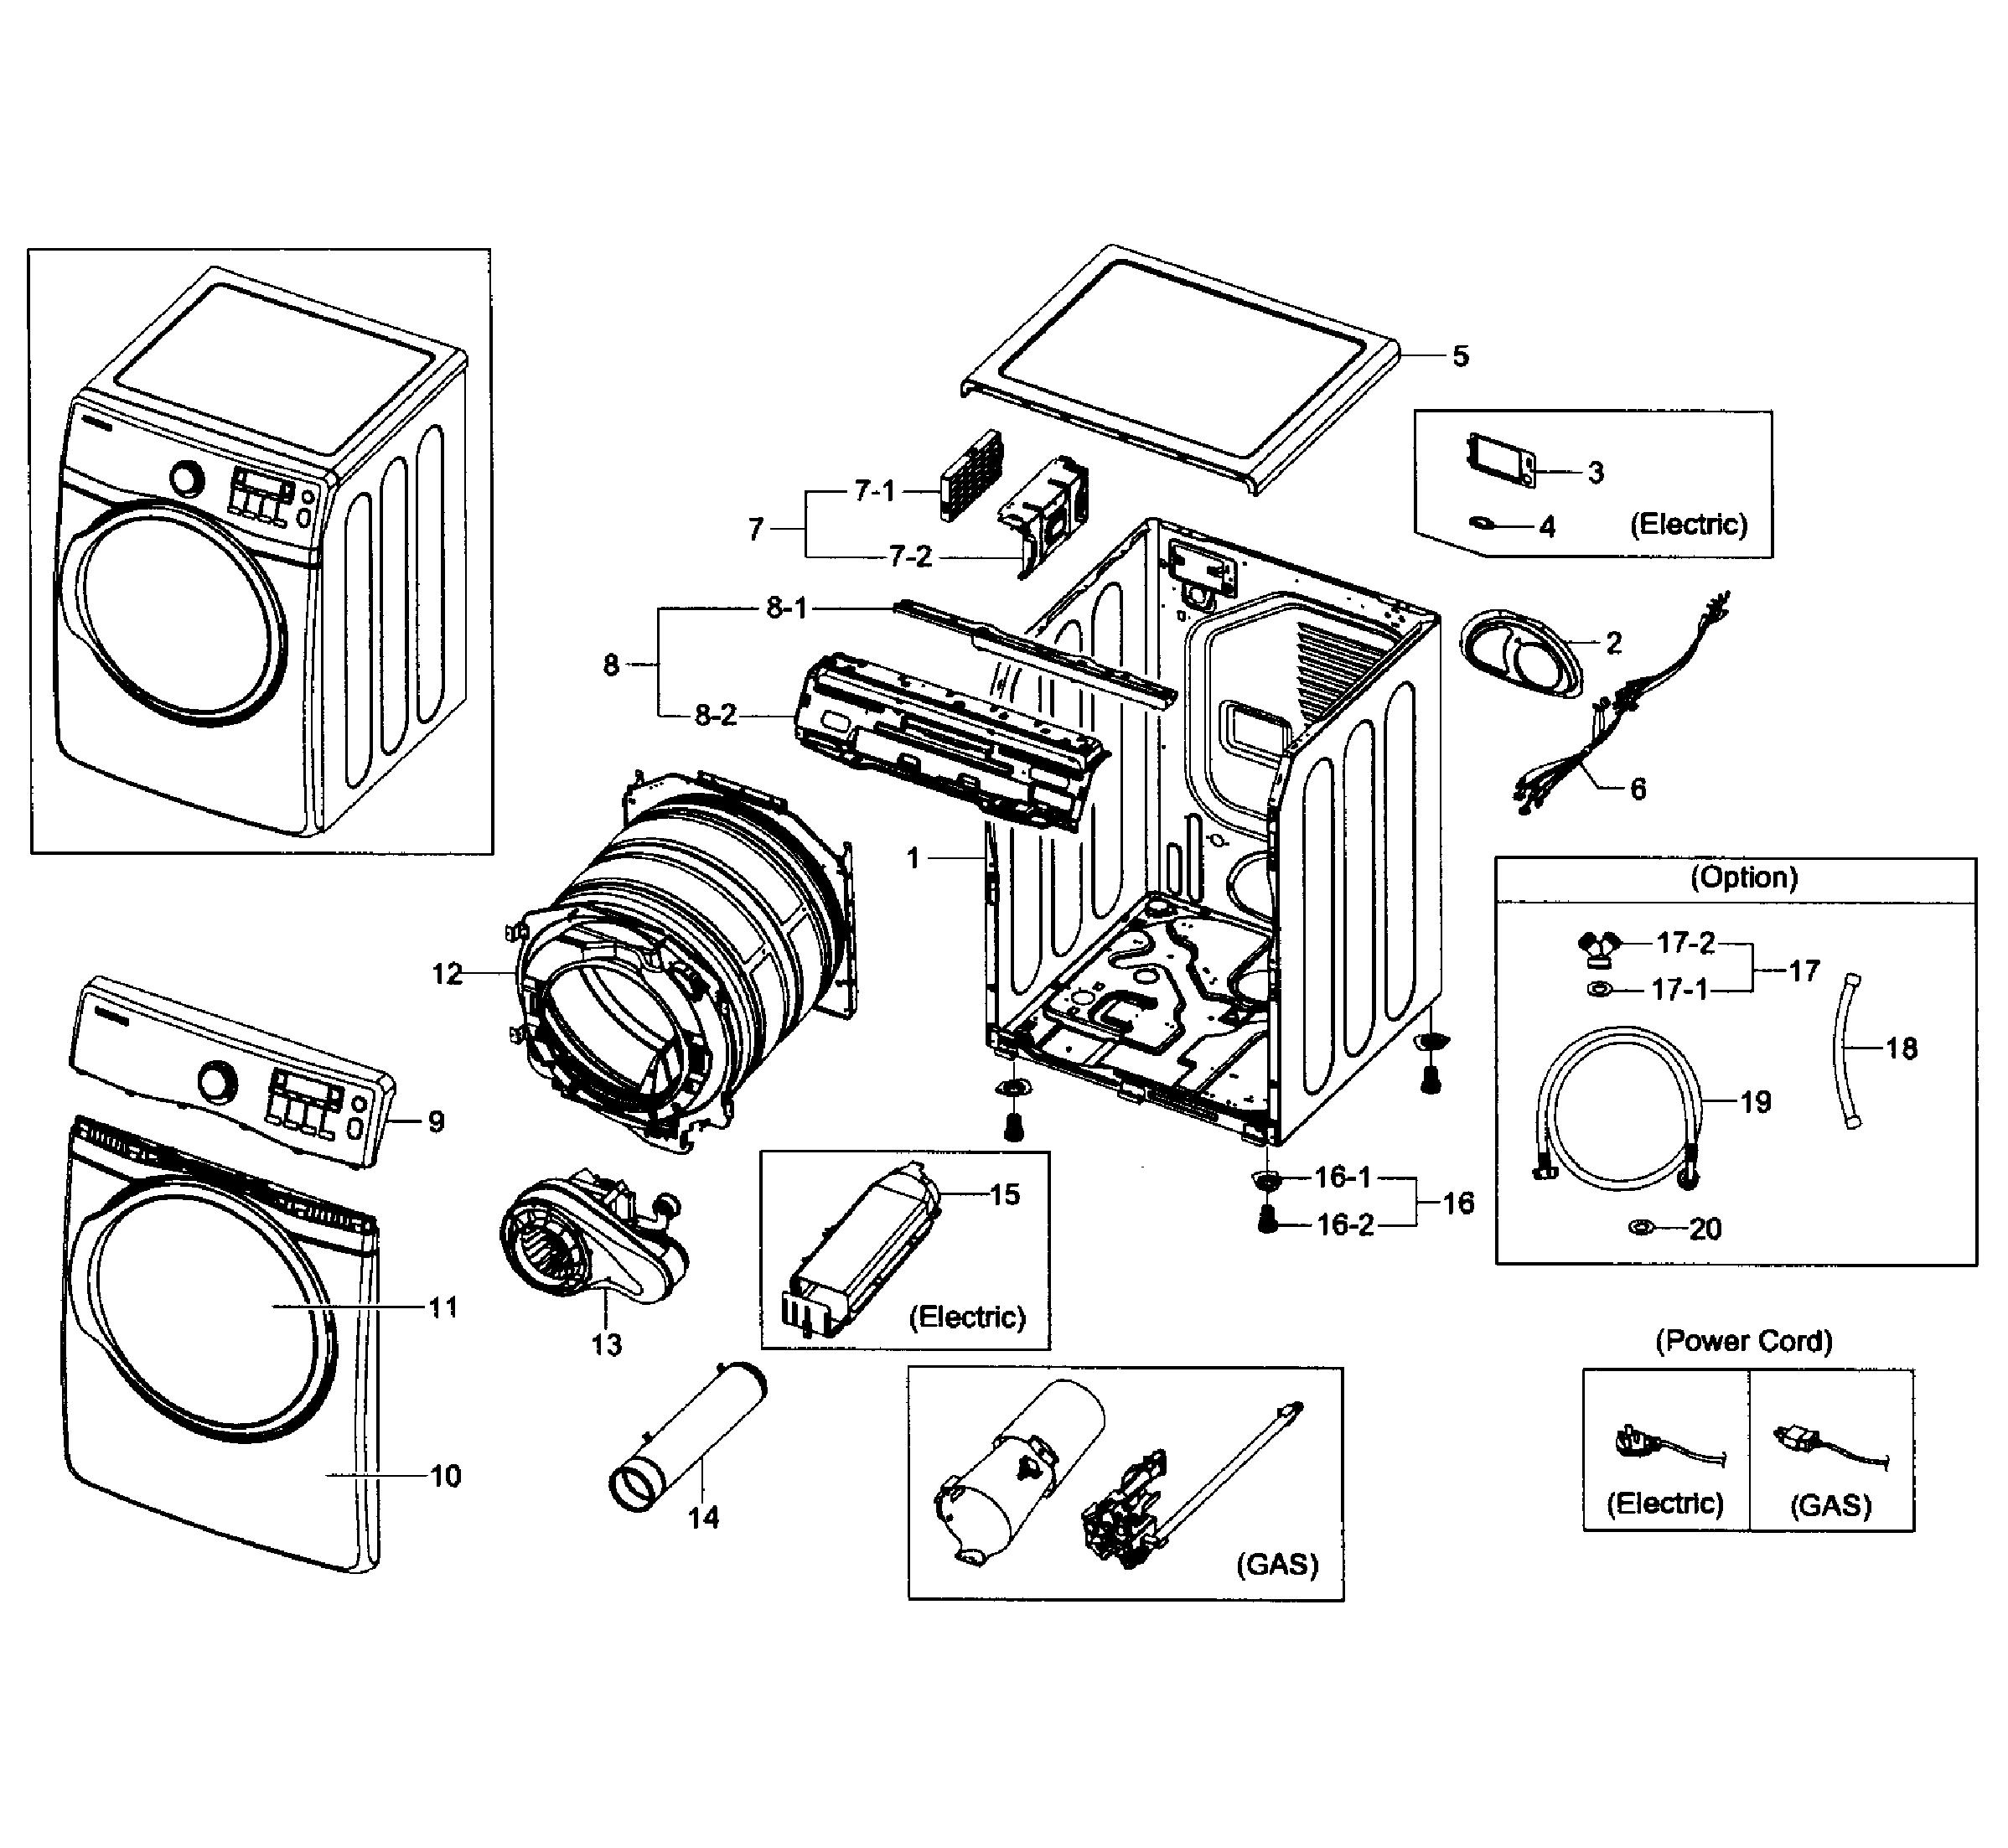 Samsung model DV431AEW/XAA-01 residential dryer genuine parts